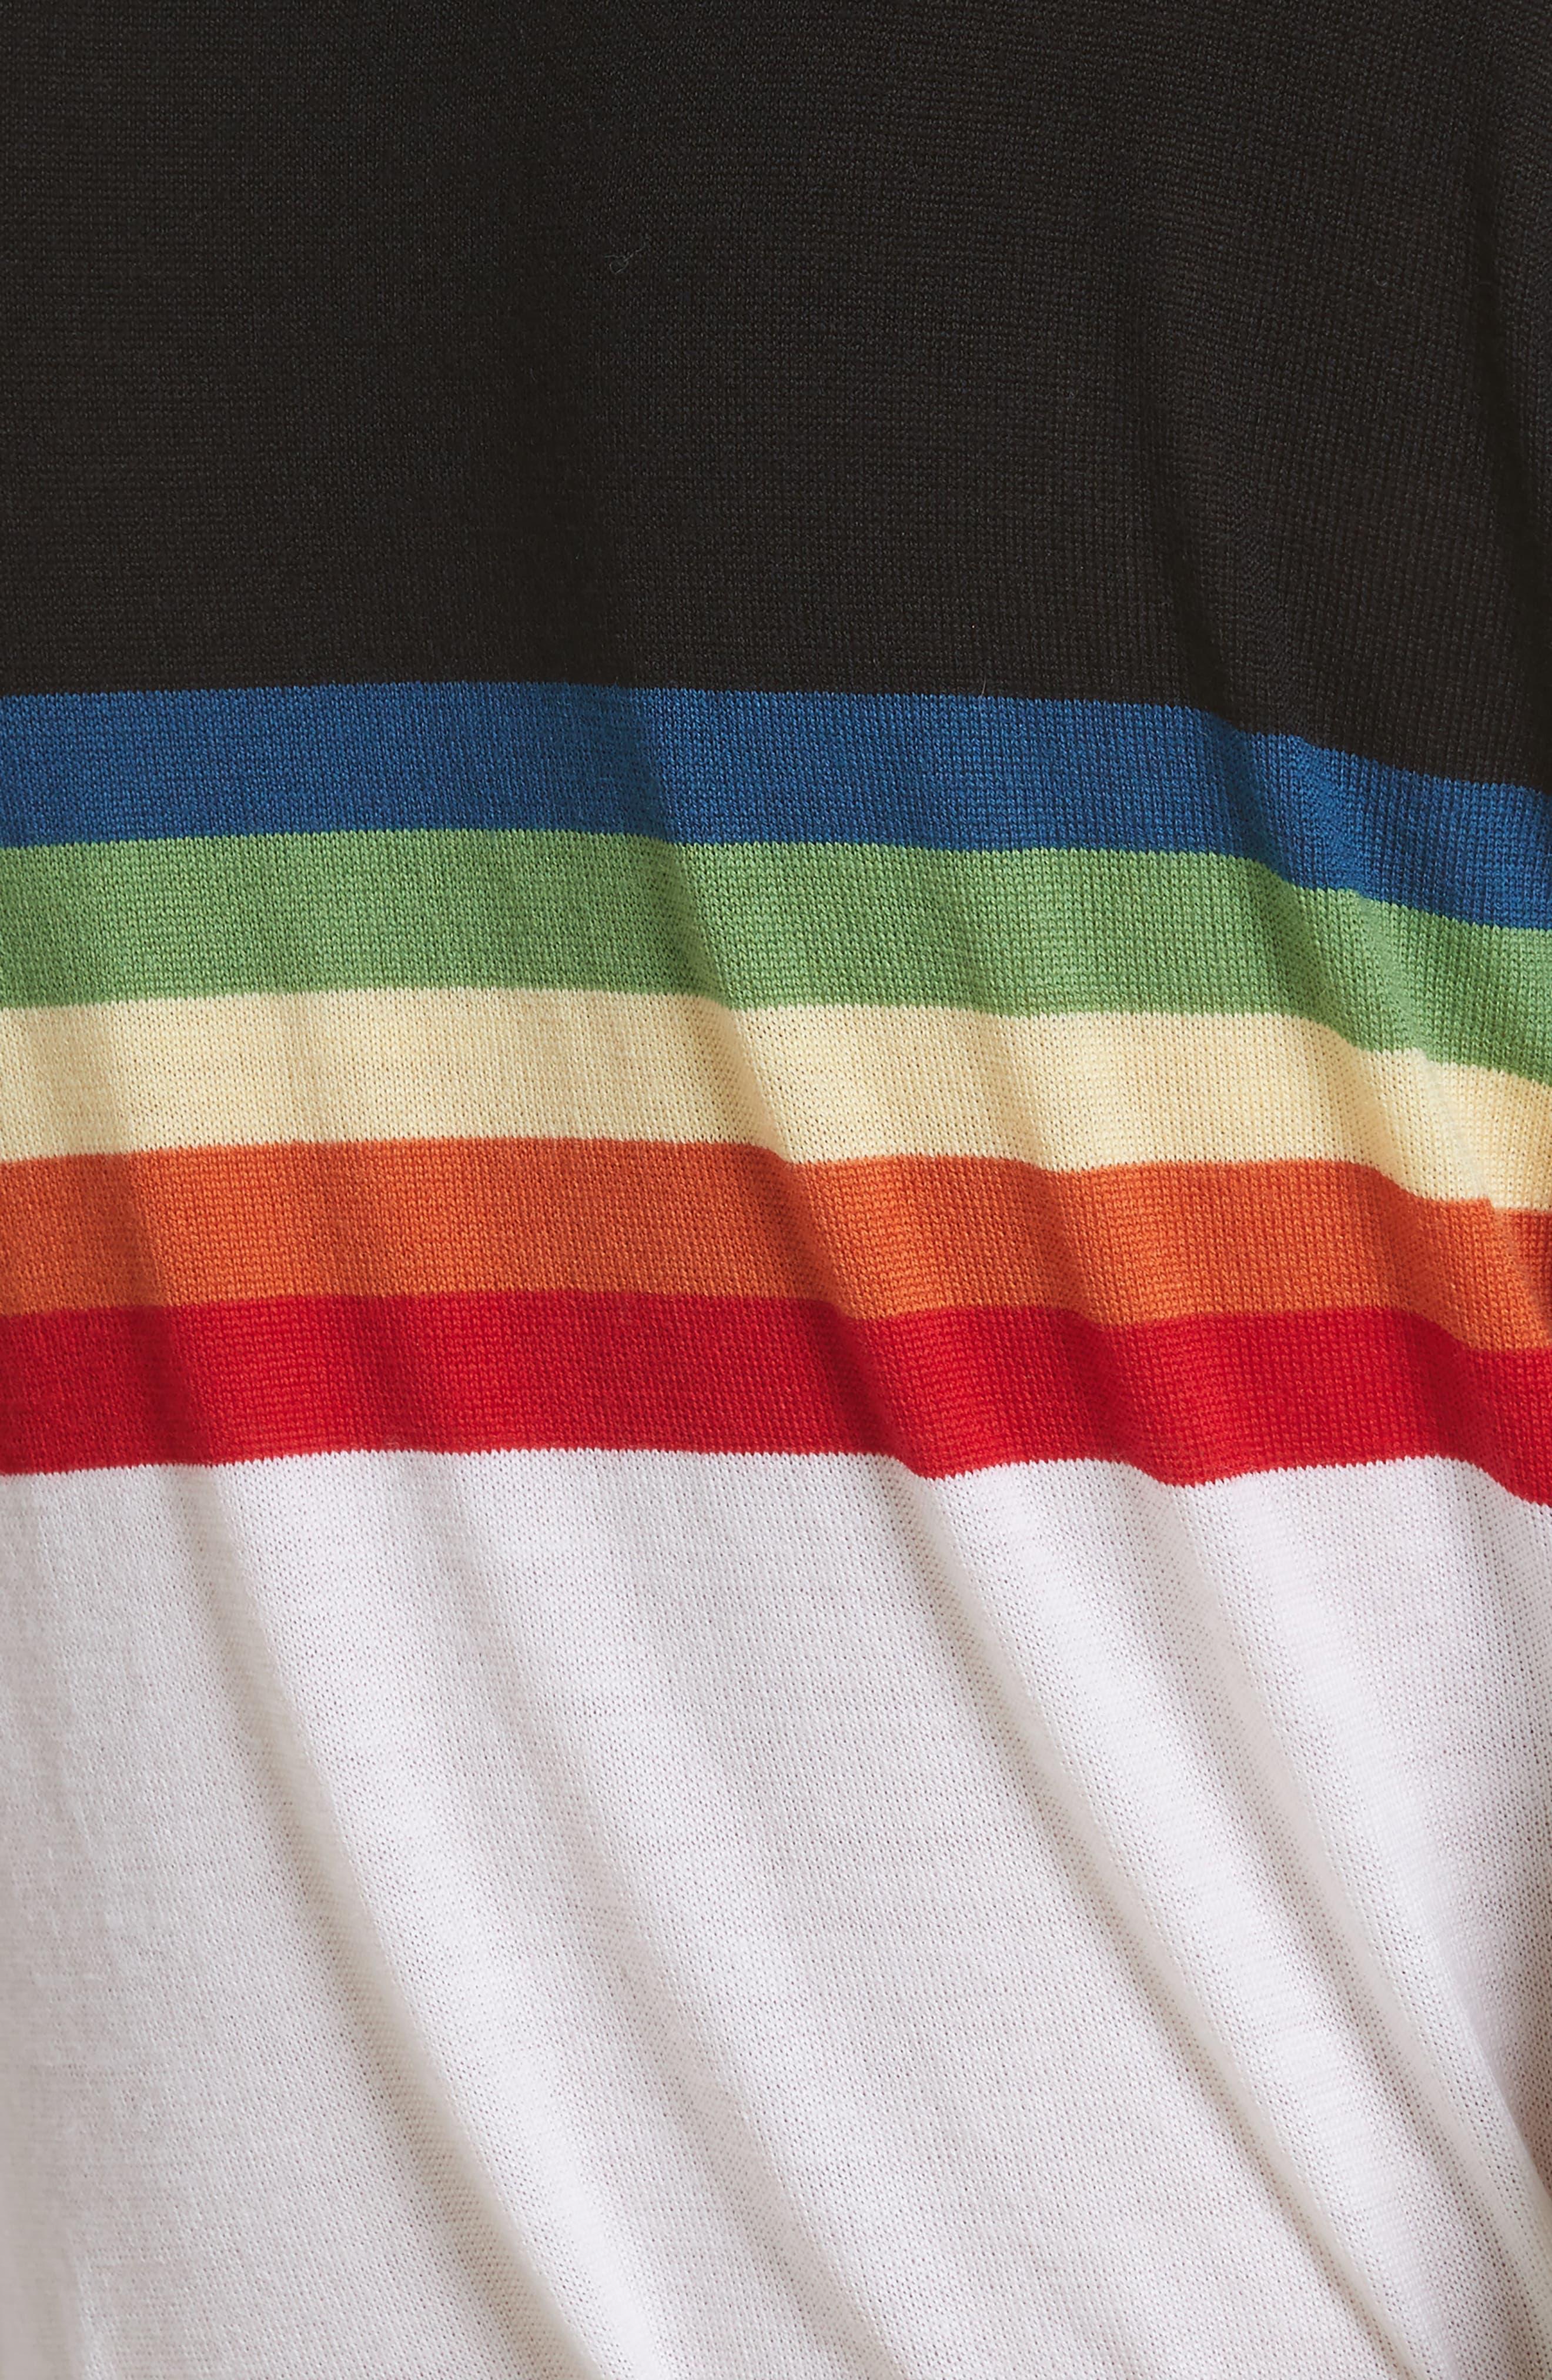 Diane von Furstenberg Rainbow Sweater,                             Alternate thumbnail 5, color,                             107